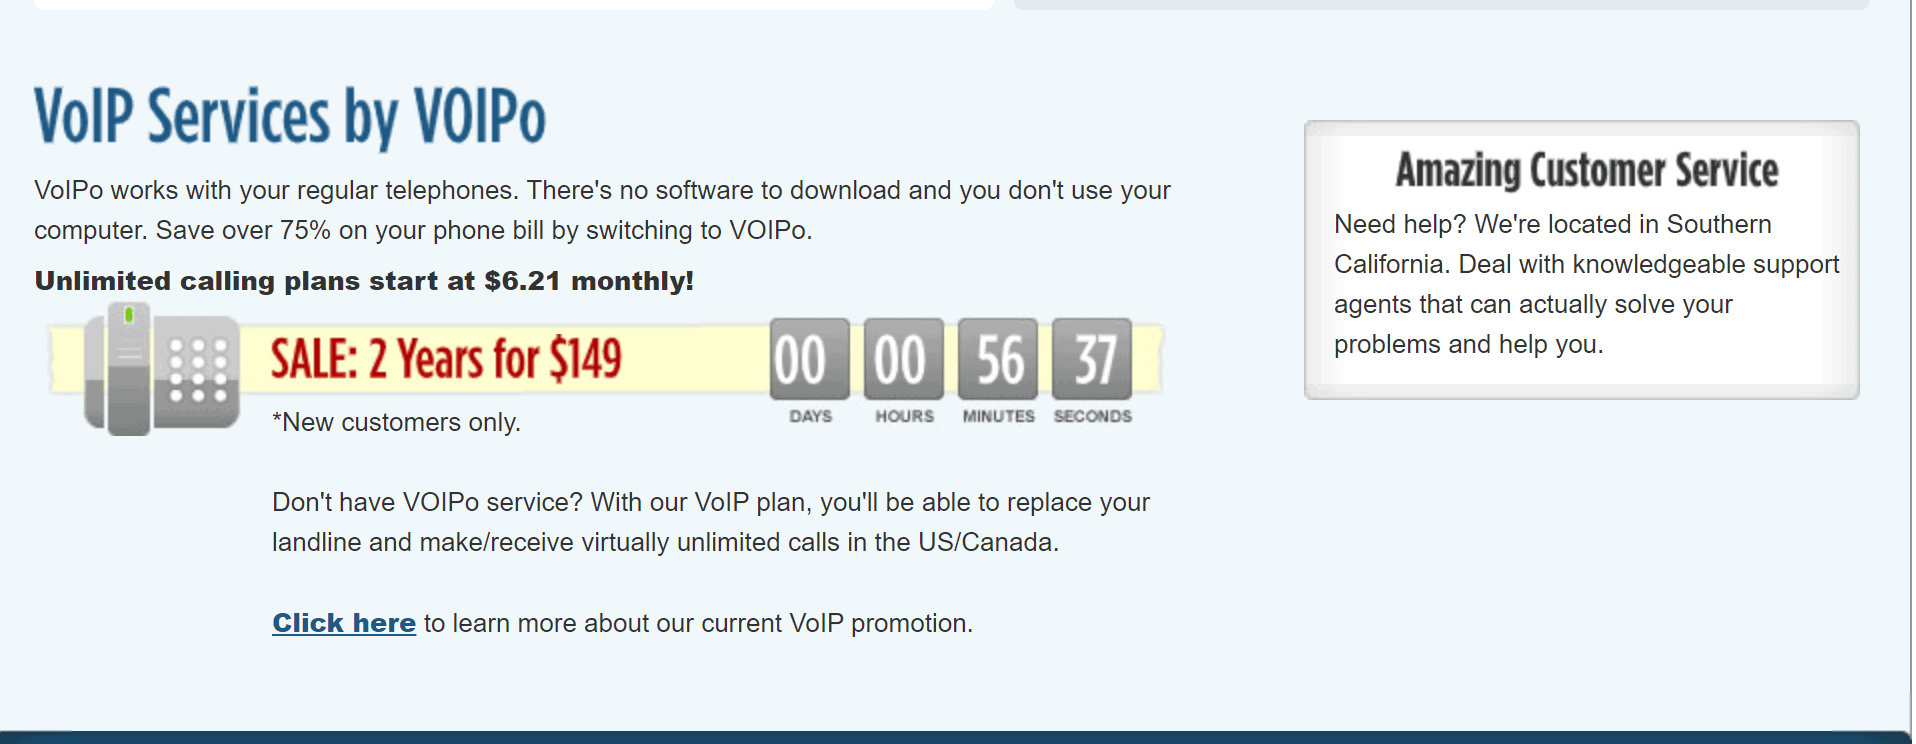 VOIPO promo codes